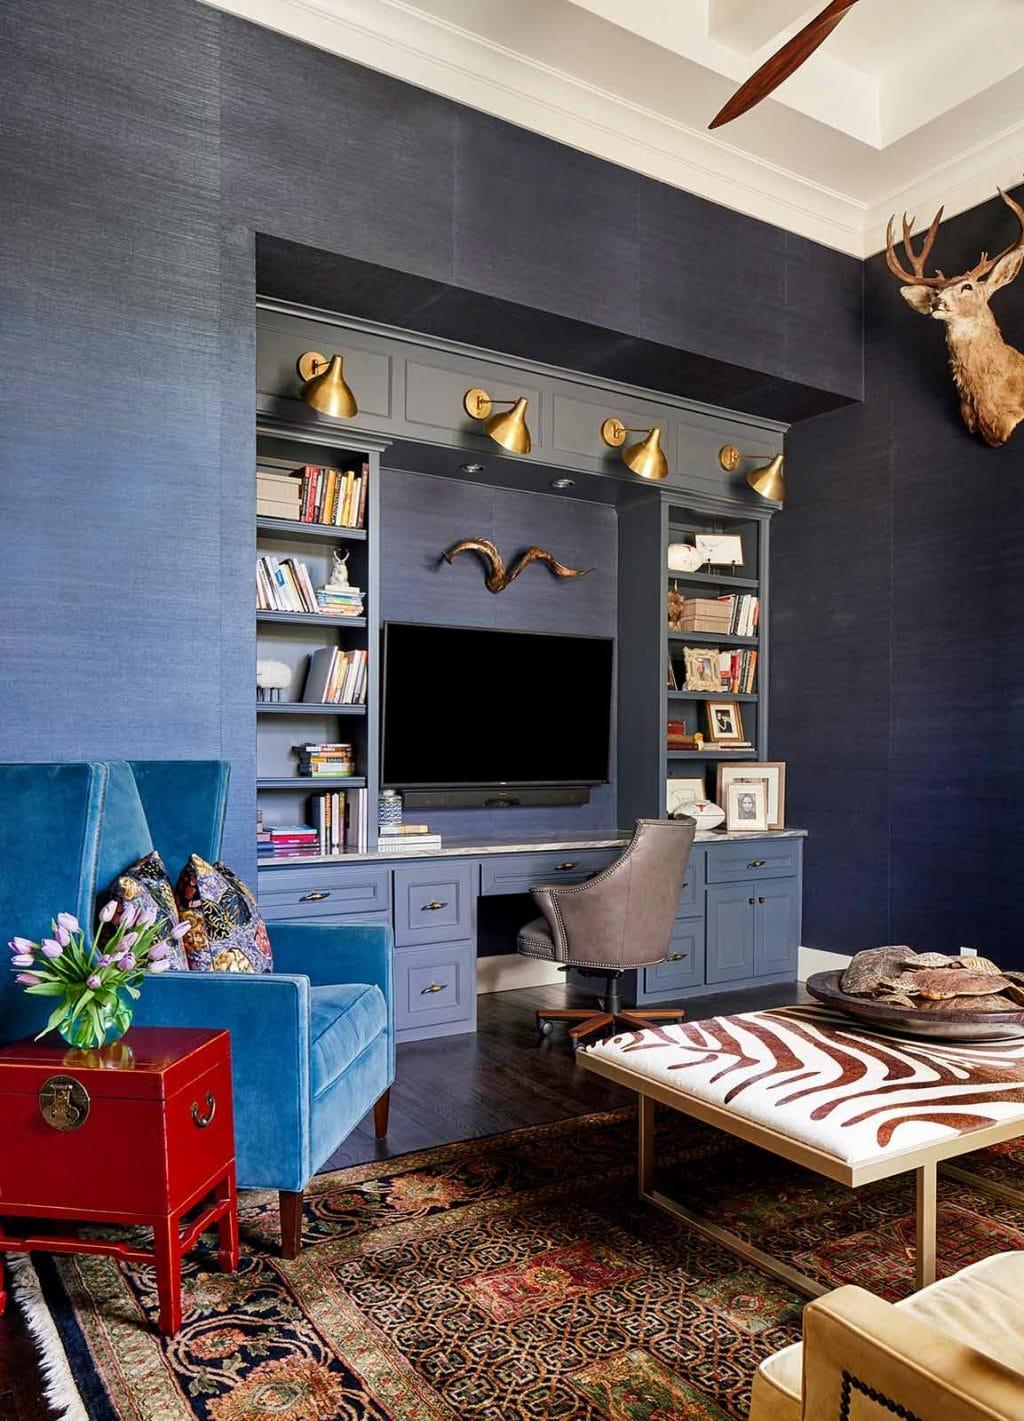 Blue grasscloth wallpaper installation in home office, desk area